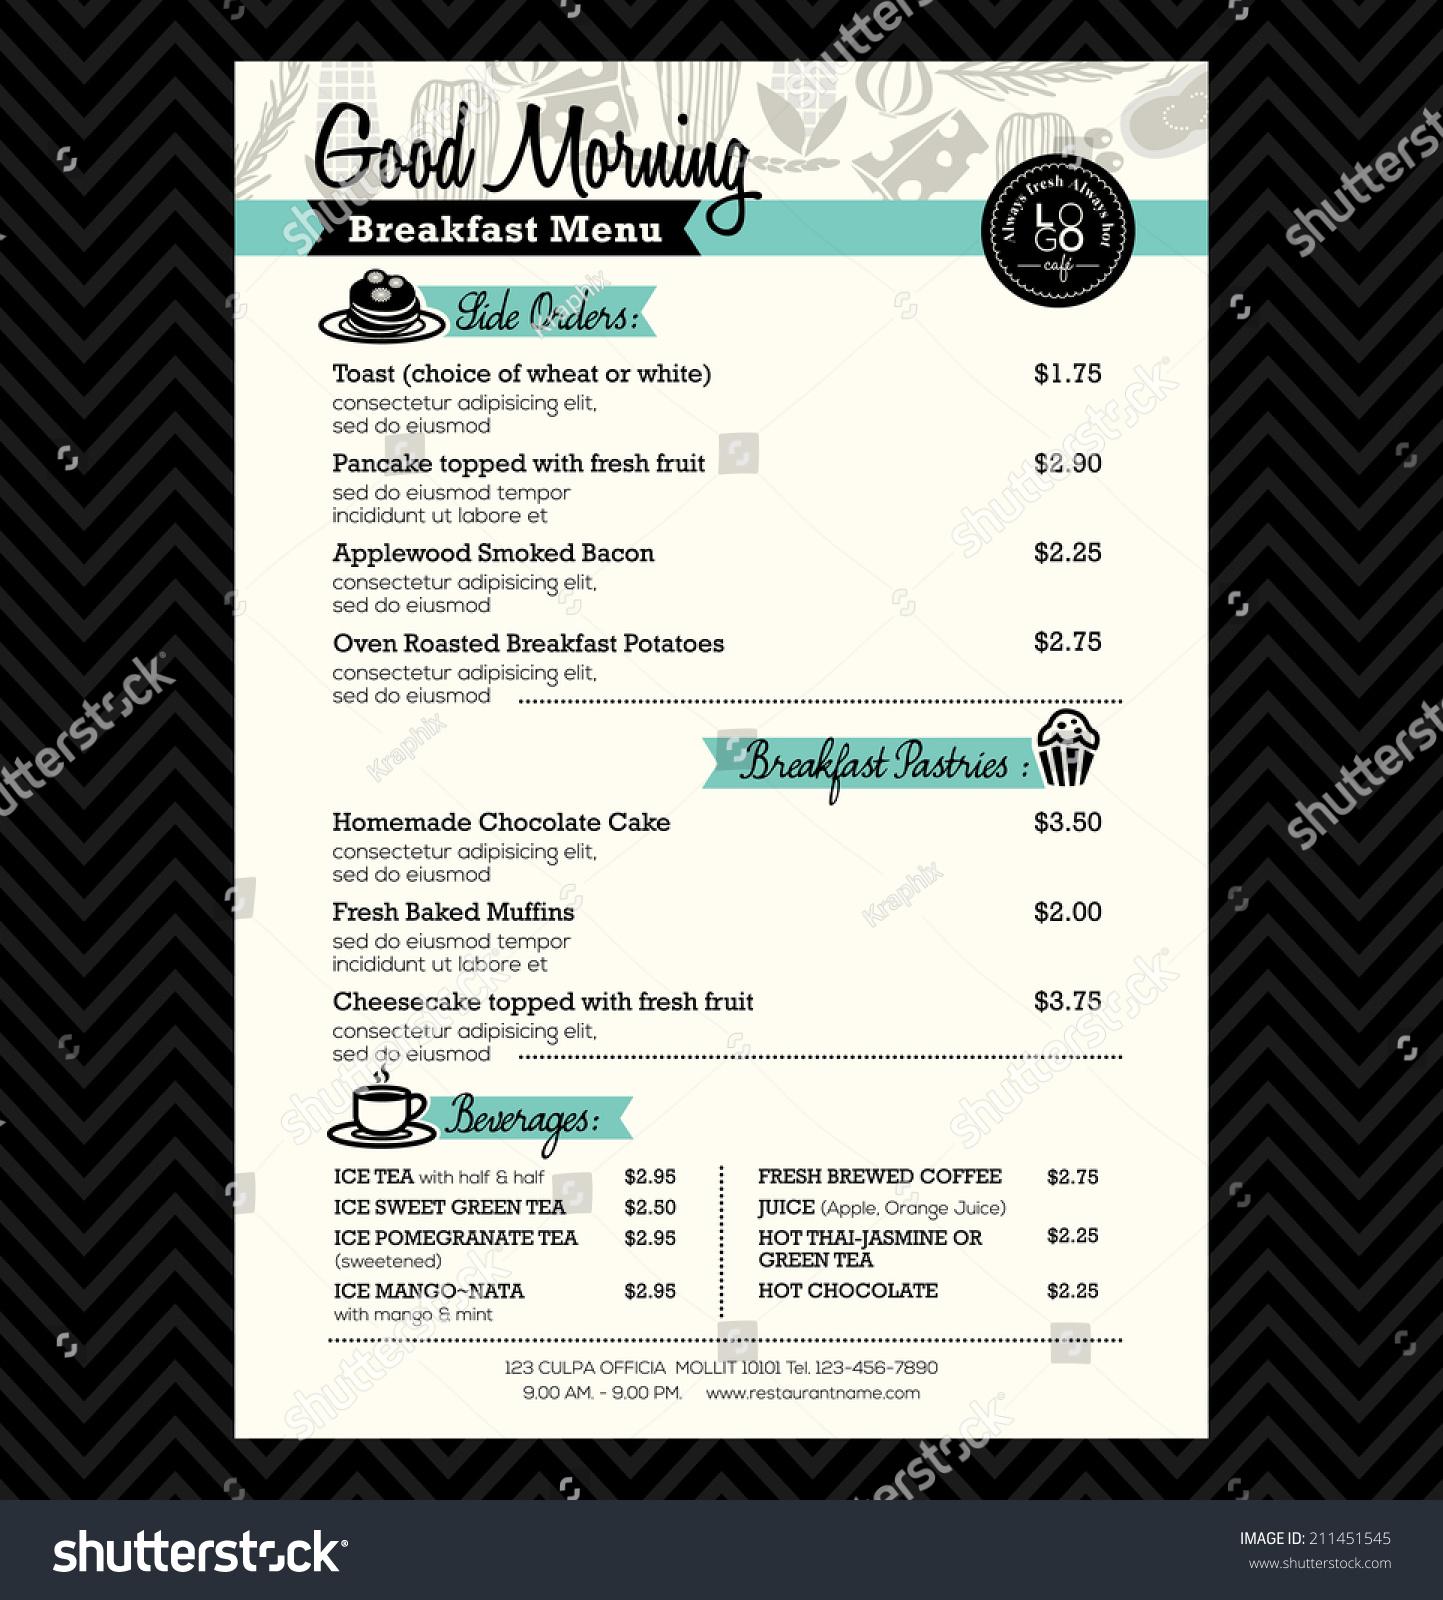 restaurant breakfast menu design template layout stock vector 211451545 shutterstock. Black Bedroom Furniture Sets. Home Design Ideas